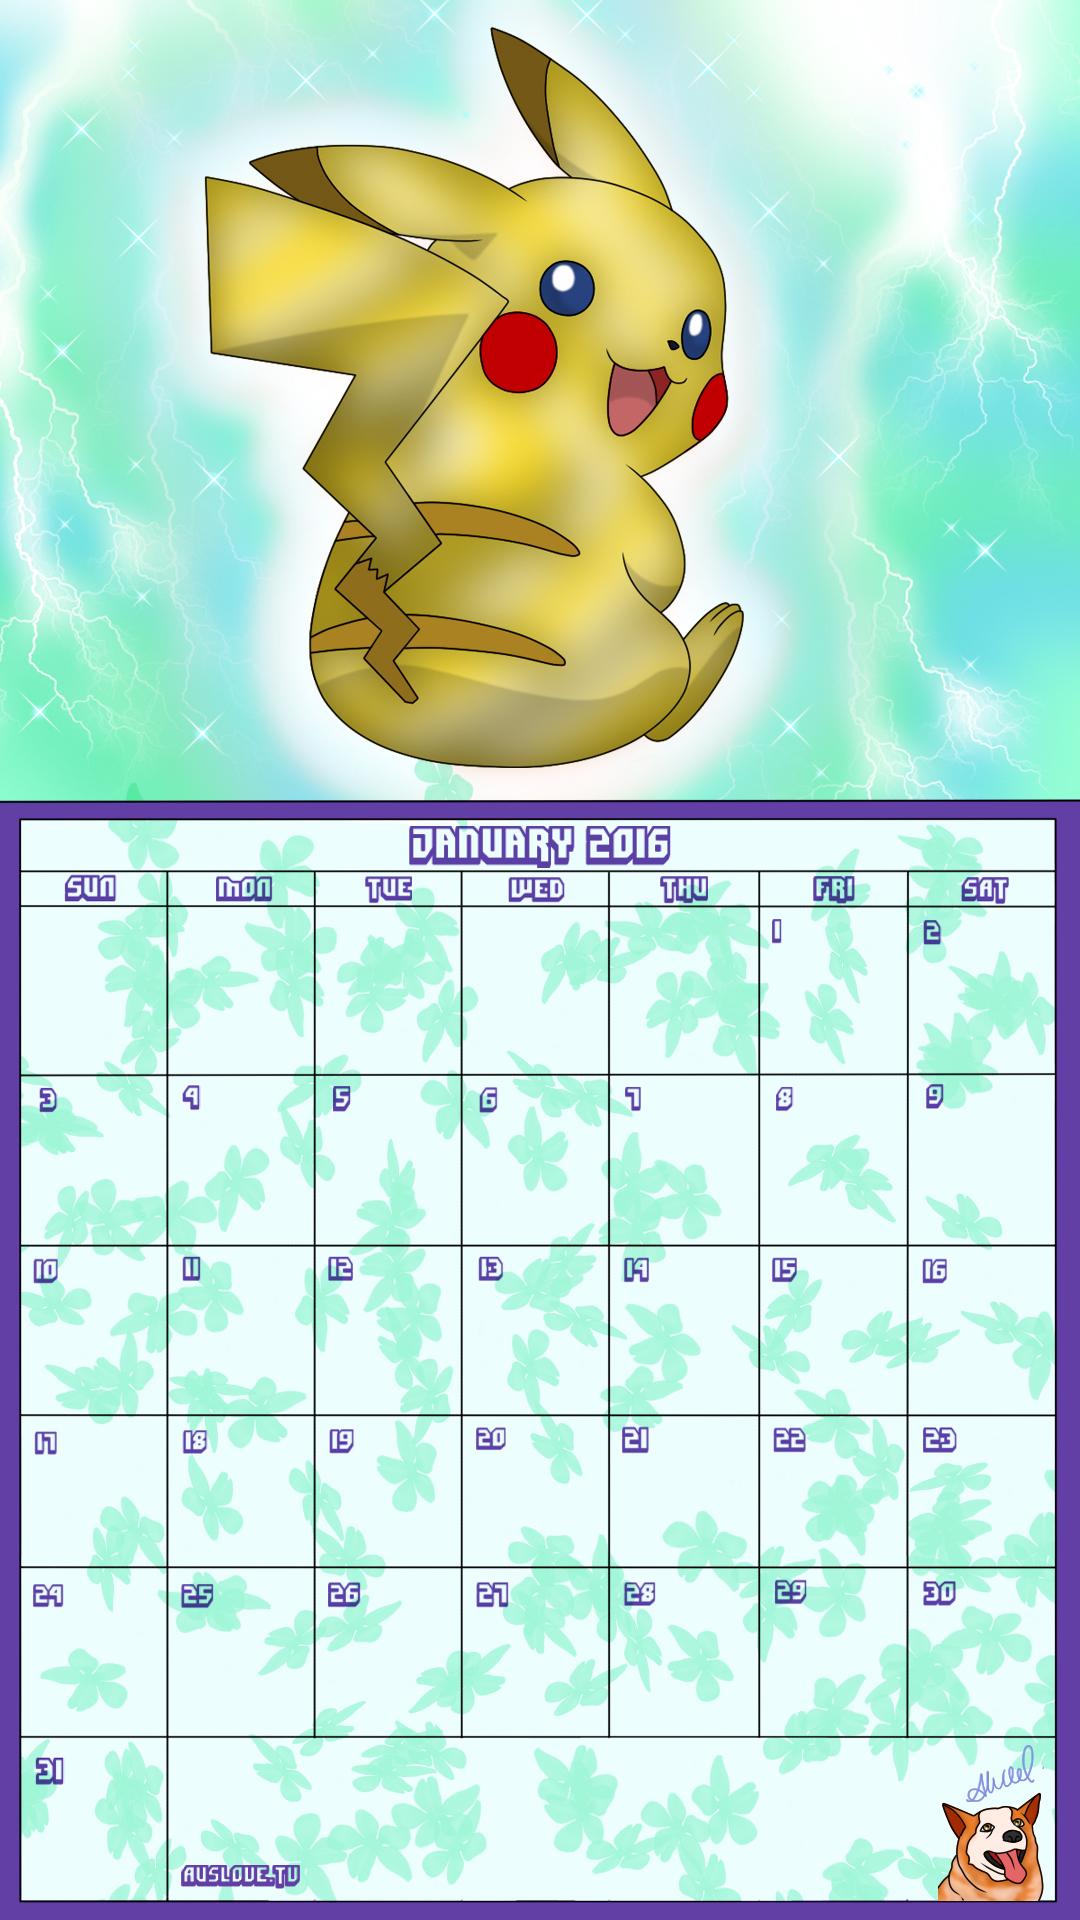 Pokemon 20th Anniversary Calender - January 2016 by AusLove